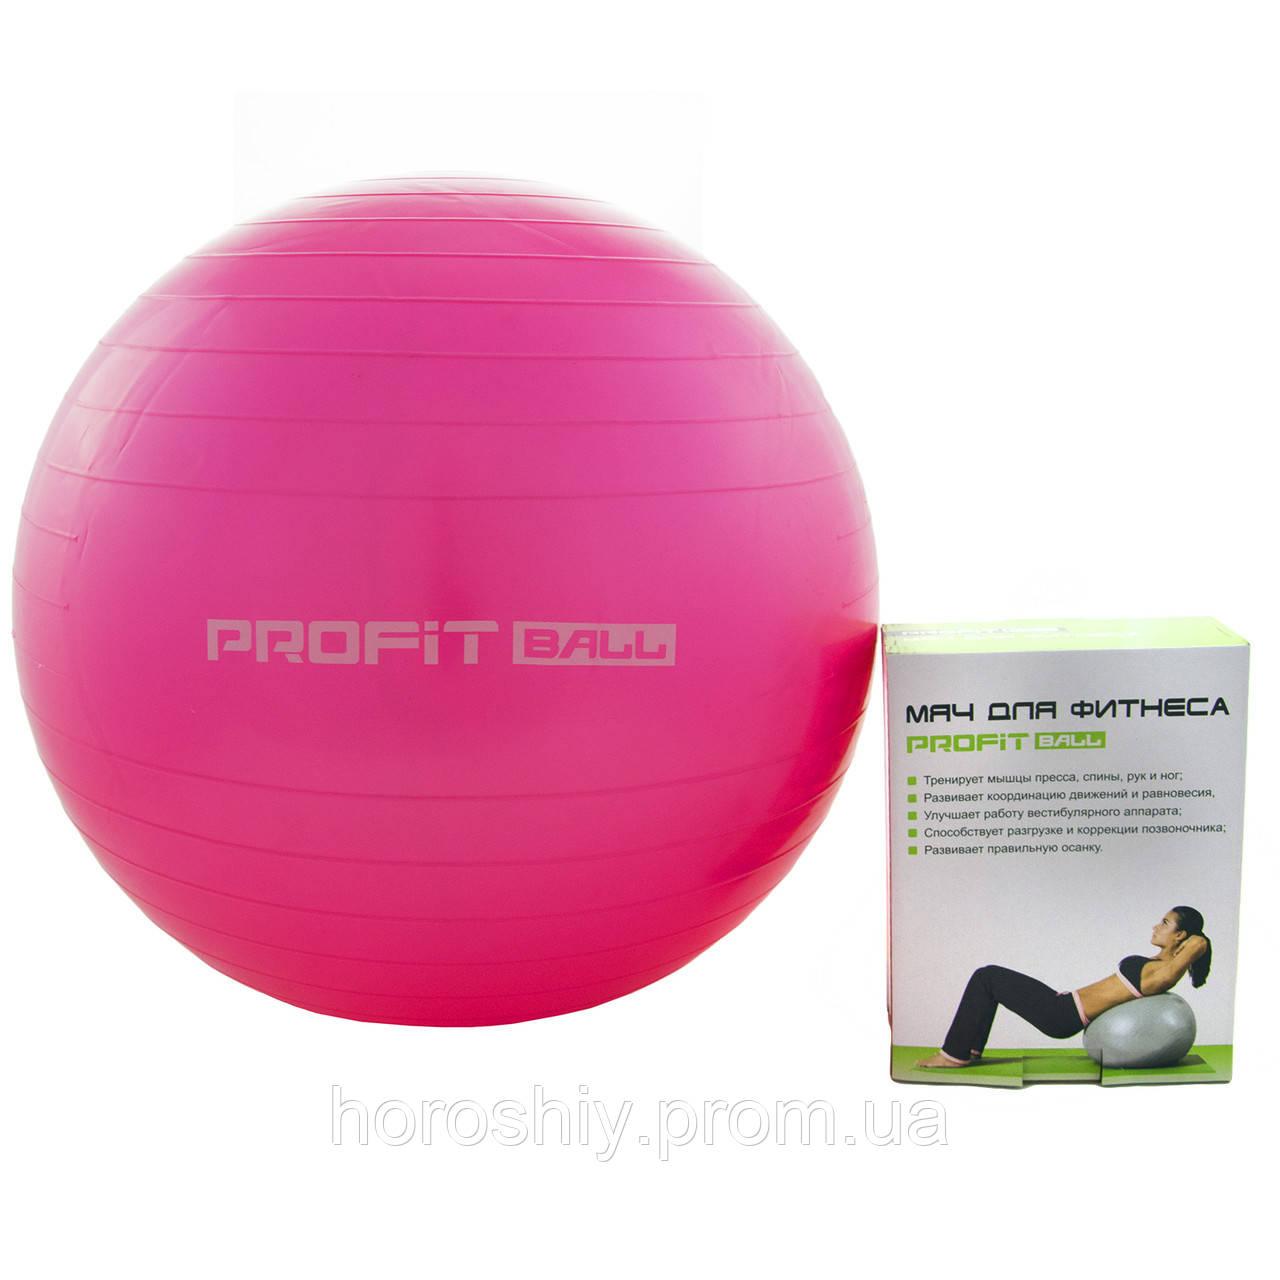 5e642b77061a75 Мяч для фитнеса Profit M0276 65 см Розовый (intM0276-2), цена 308 грн.,  купить Пологи — Prom.ua (ID#889951655)